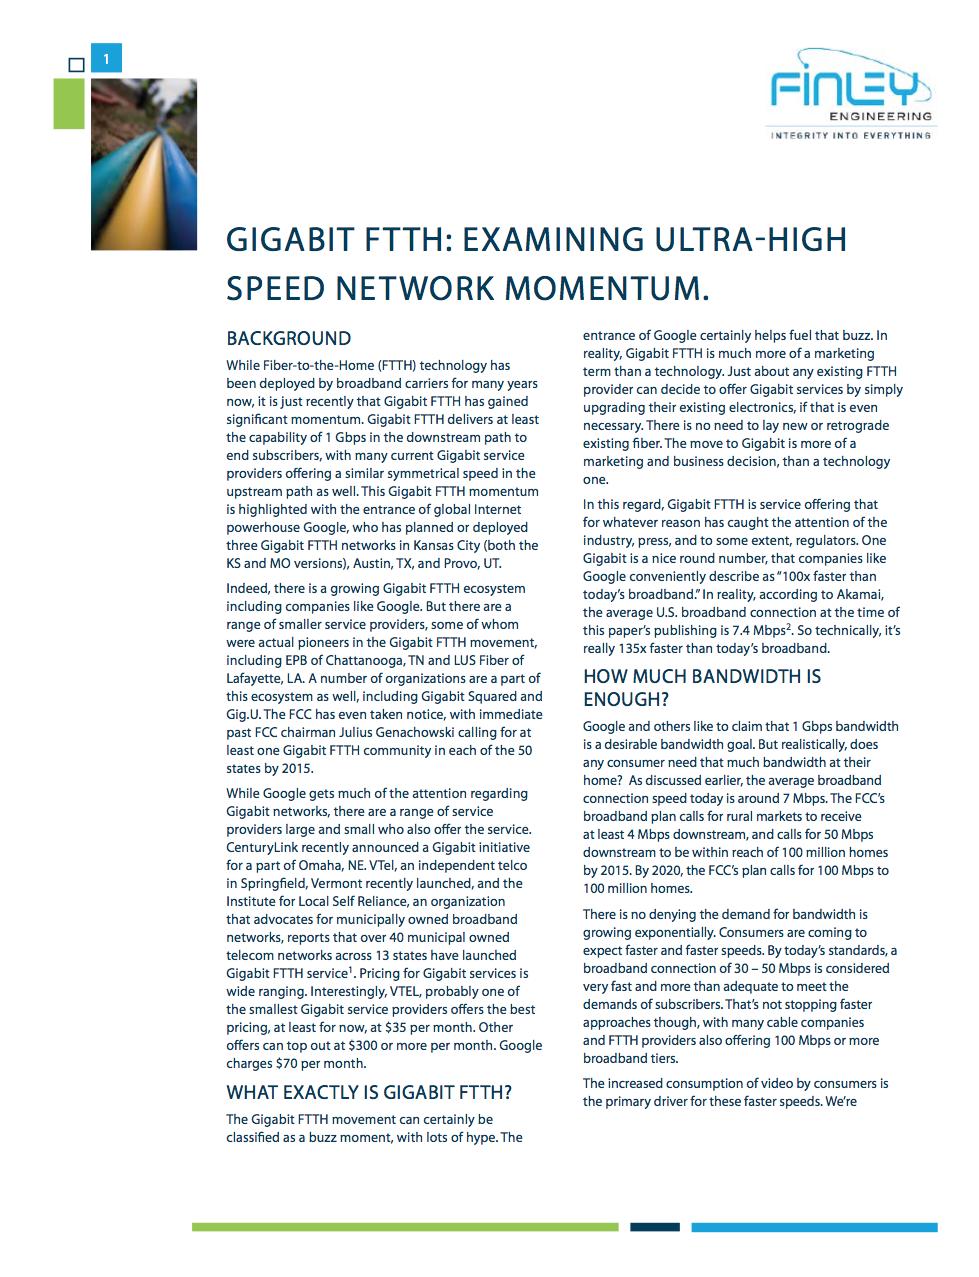 gigabit-ftth